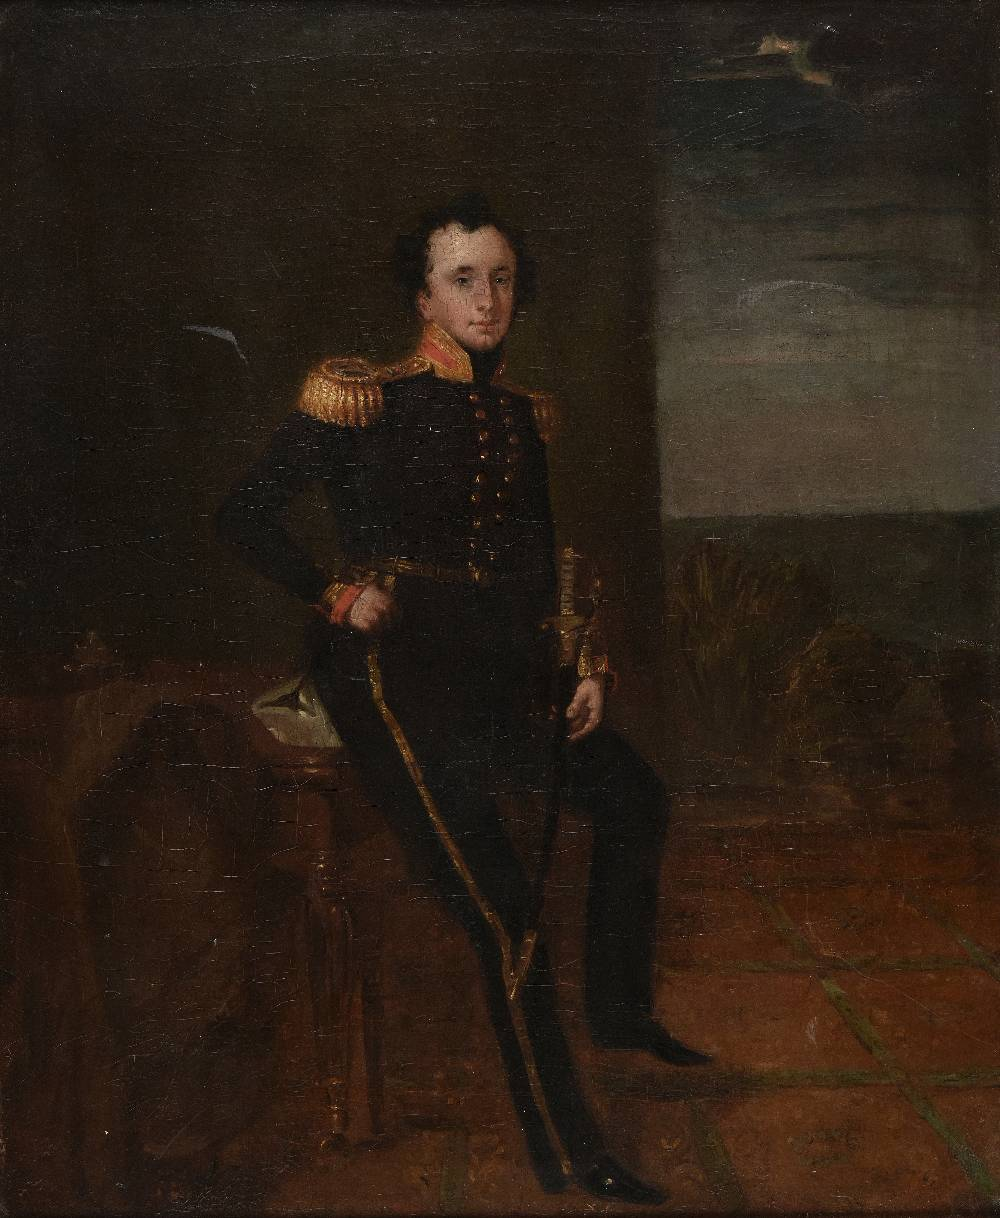 Lot 14 - *English School. Portrait of Captain Follett Walrond Pennell, in Royal Navy uniform, circa 1828, oil